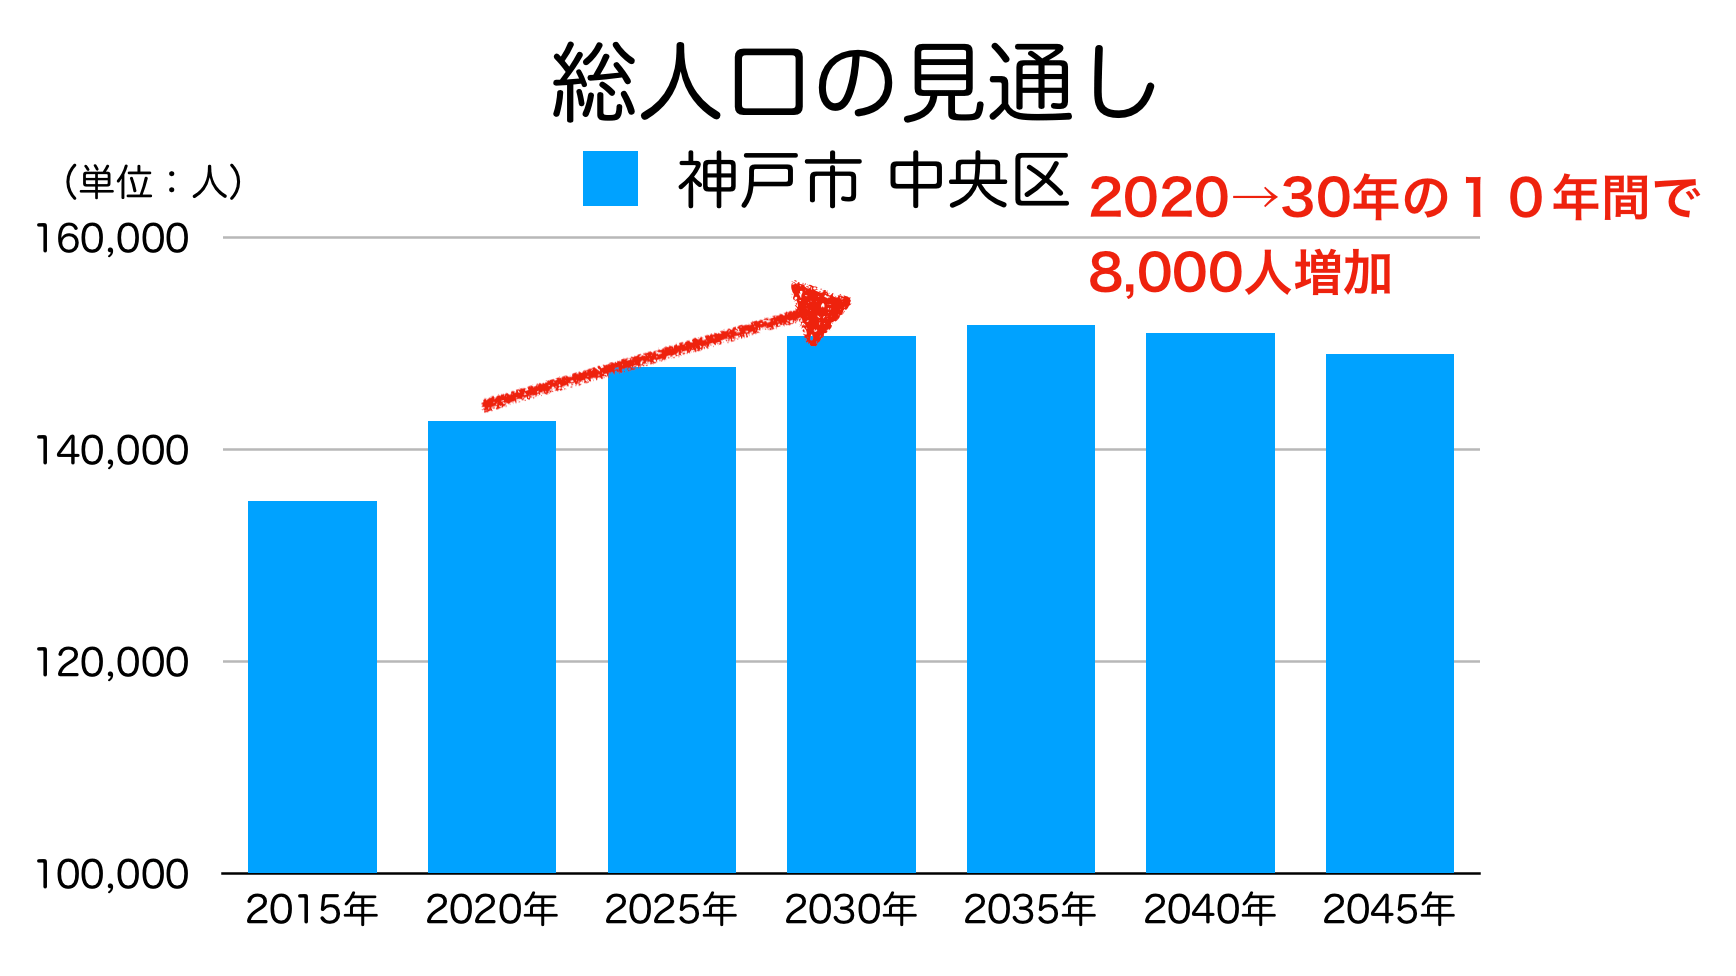 神戸市中央区の人口予測